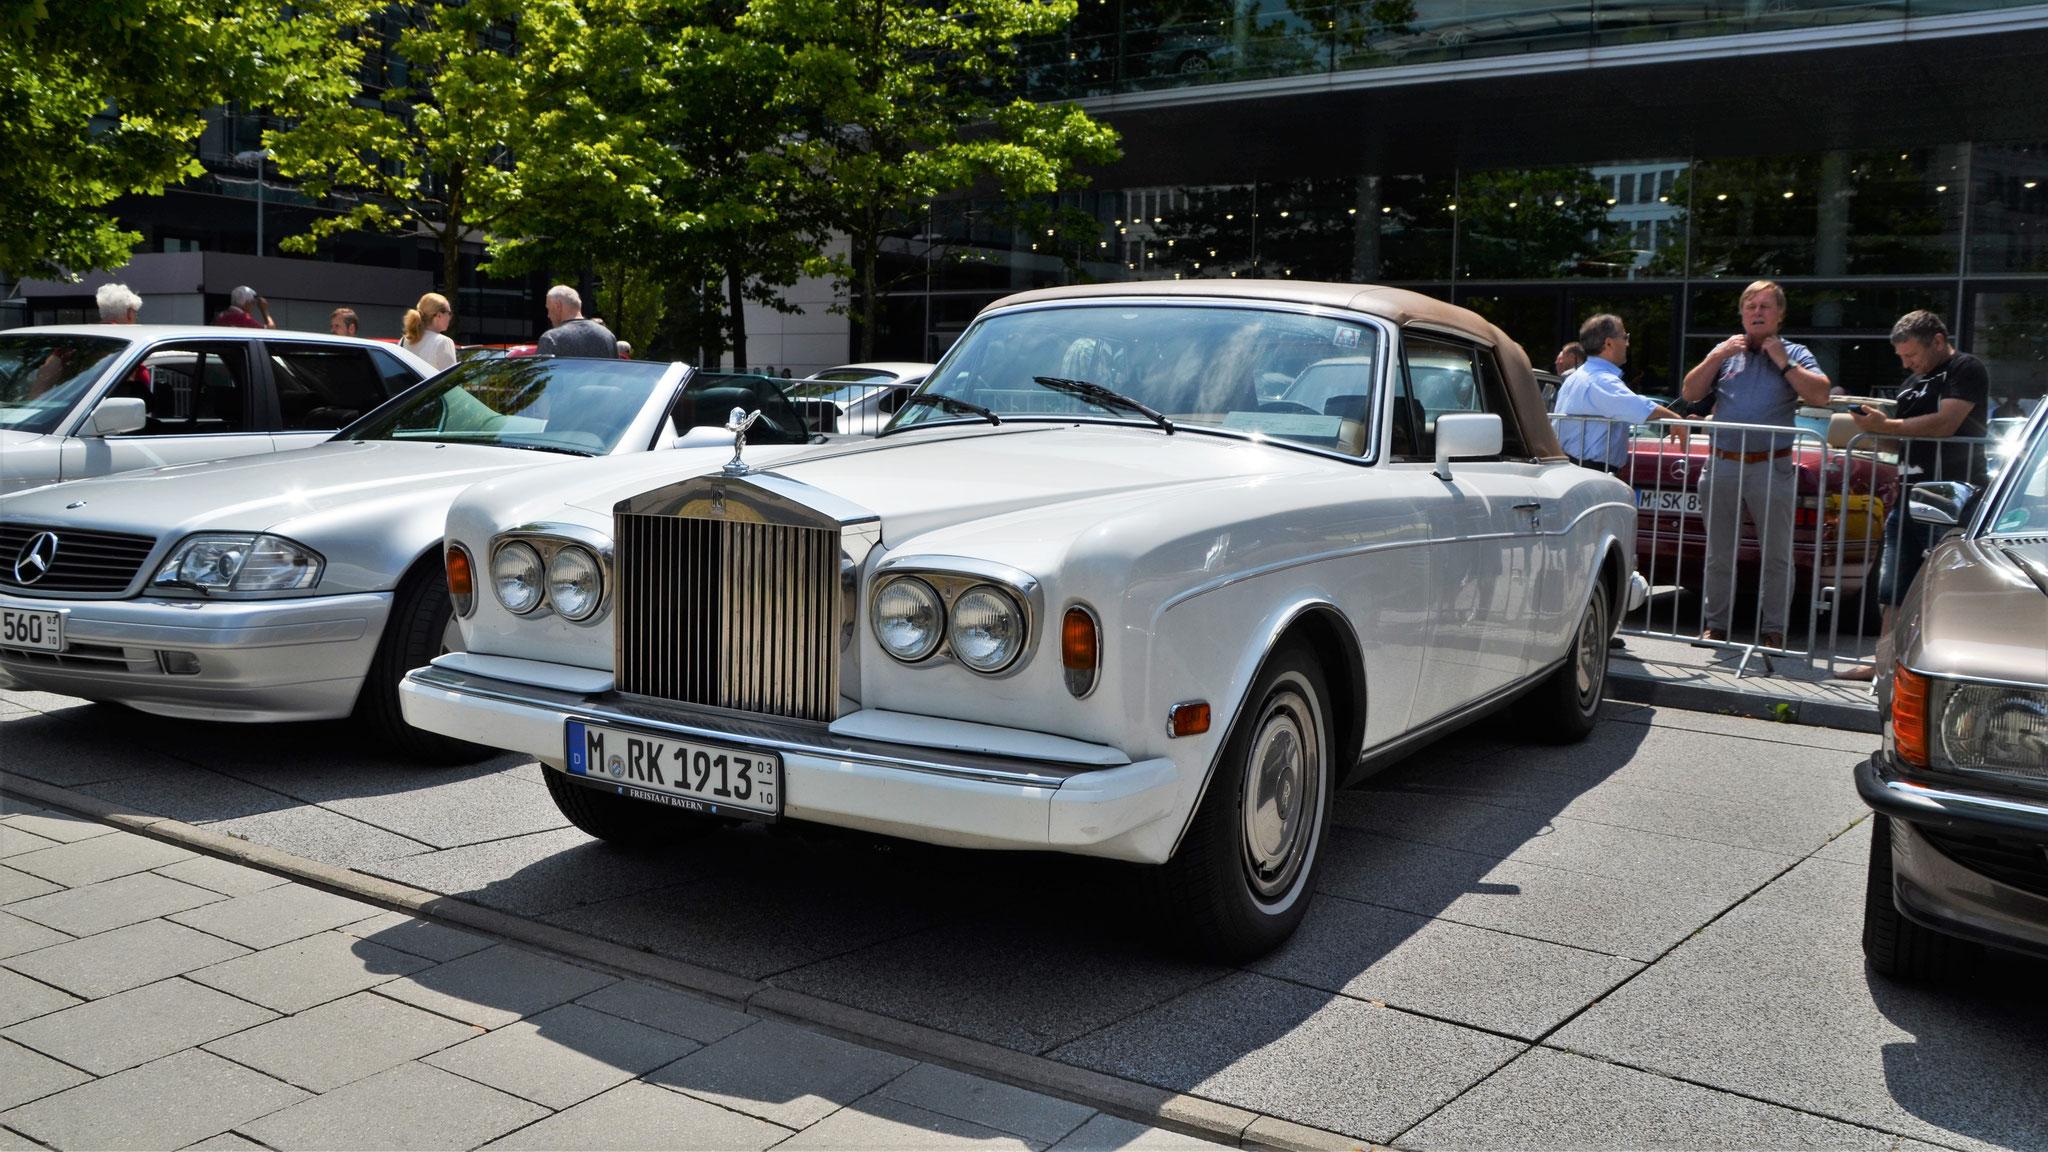 Rolls Royce Corniche - M-RK-1913